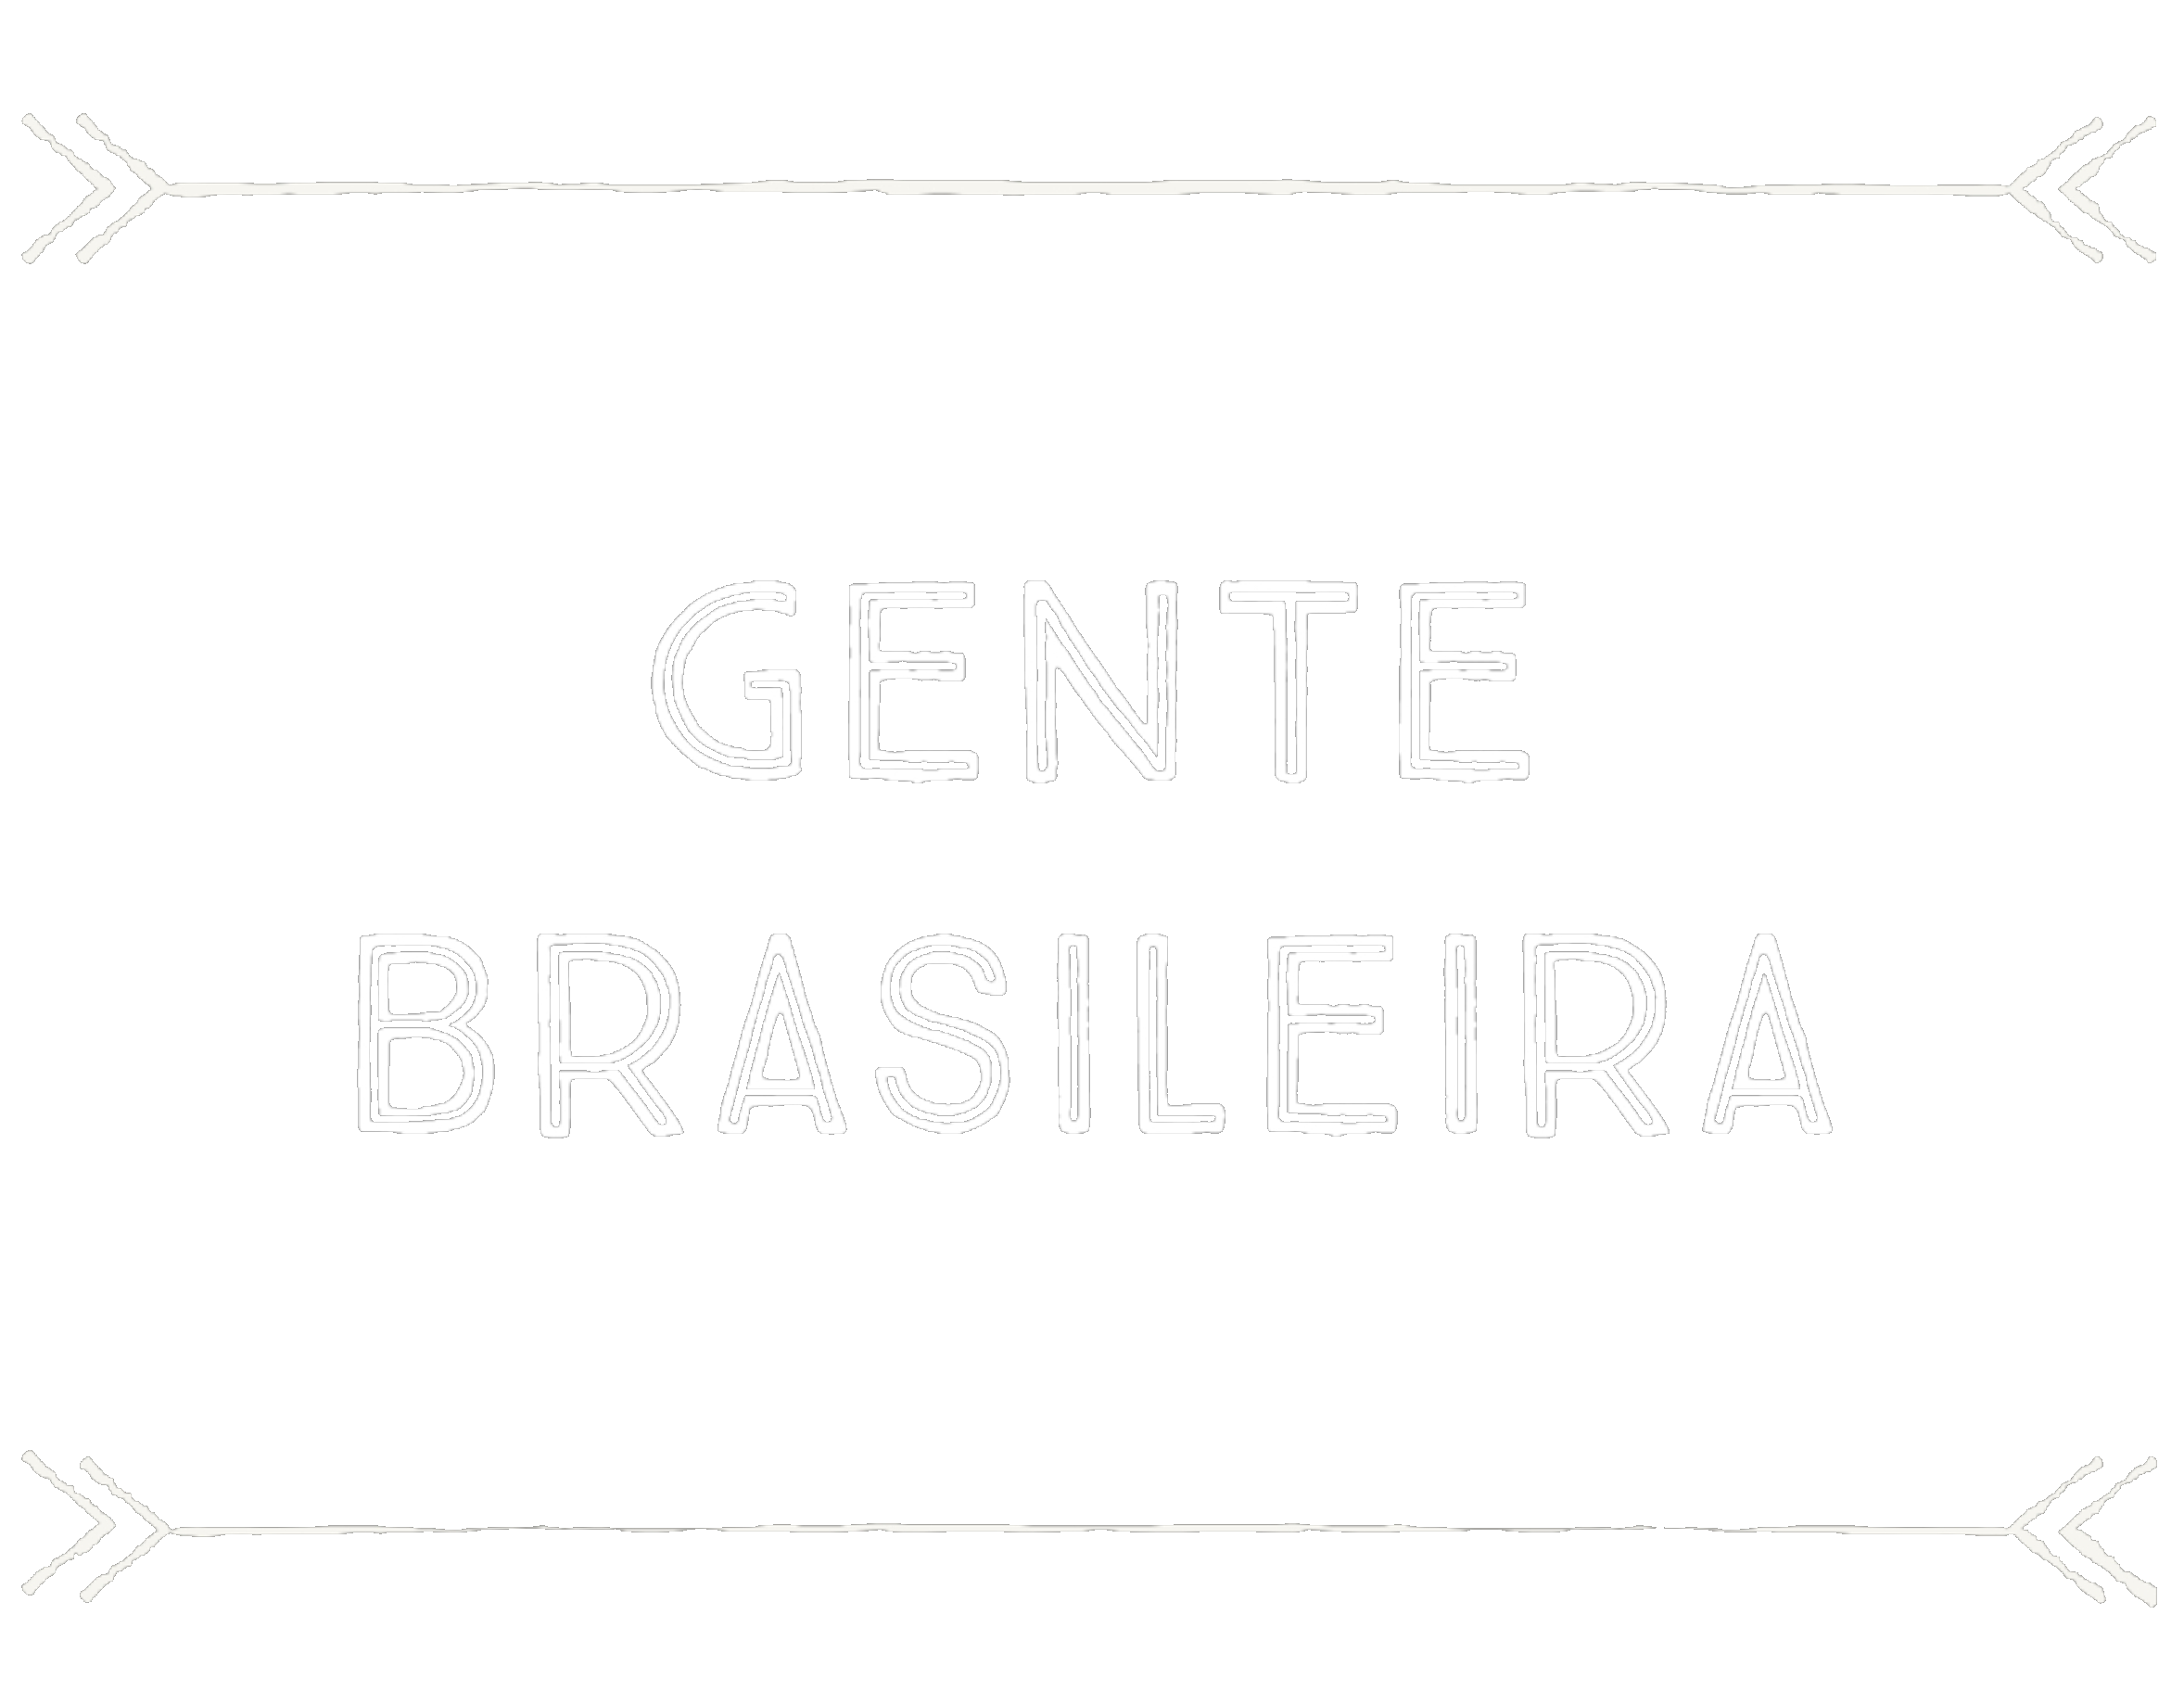 Gente Brasileira